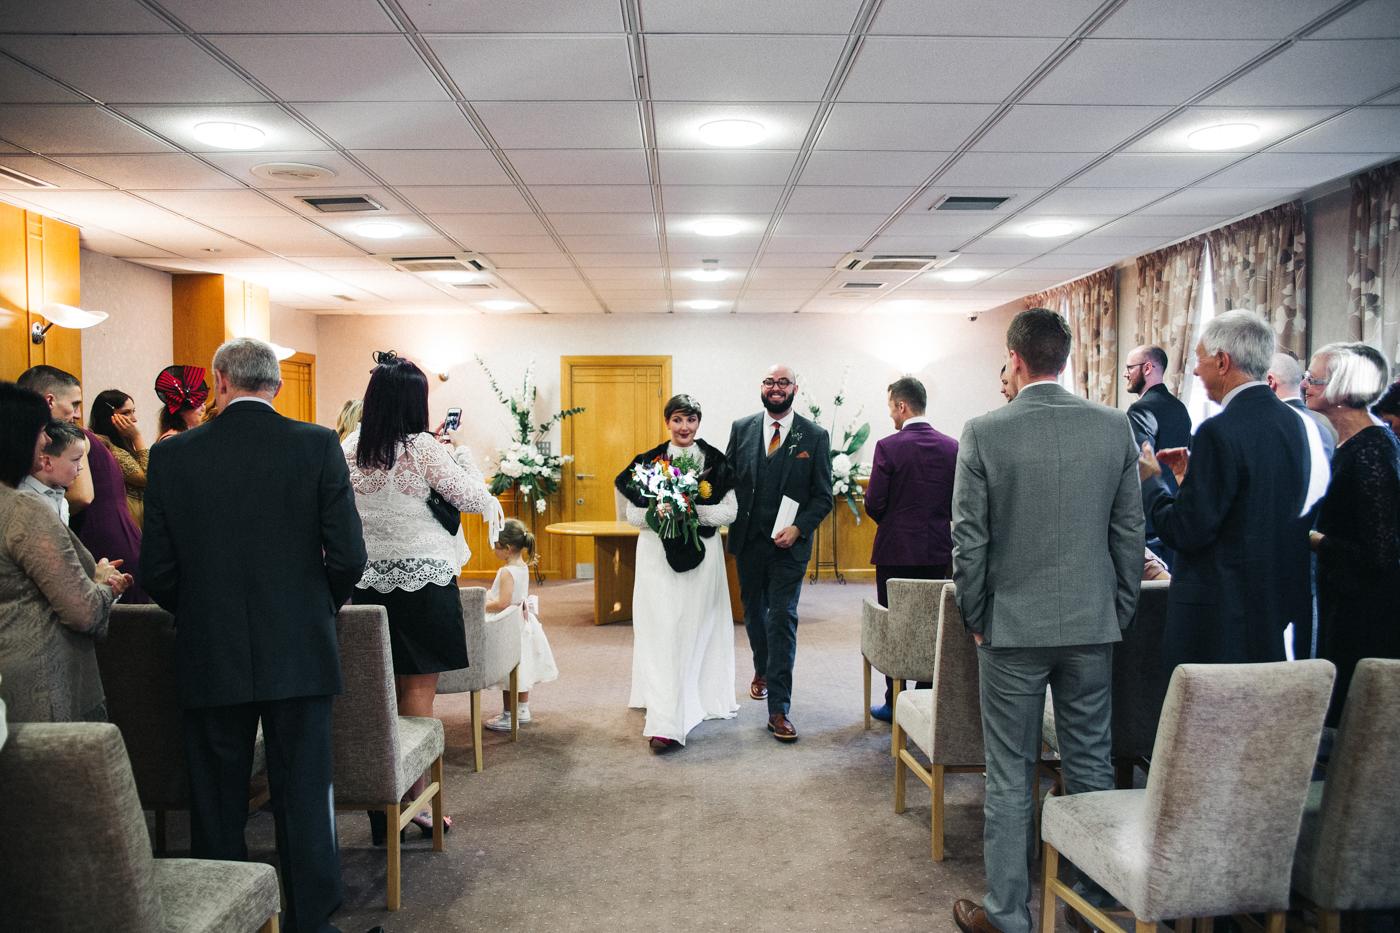 teesside-newcastle-gateshead-wedding-photography-photographer-creative-0040.jpg